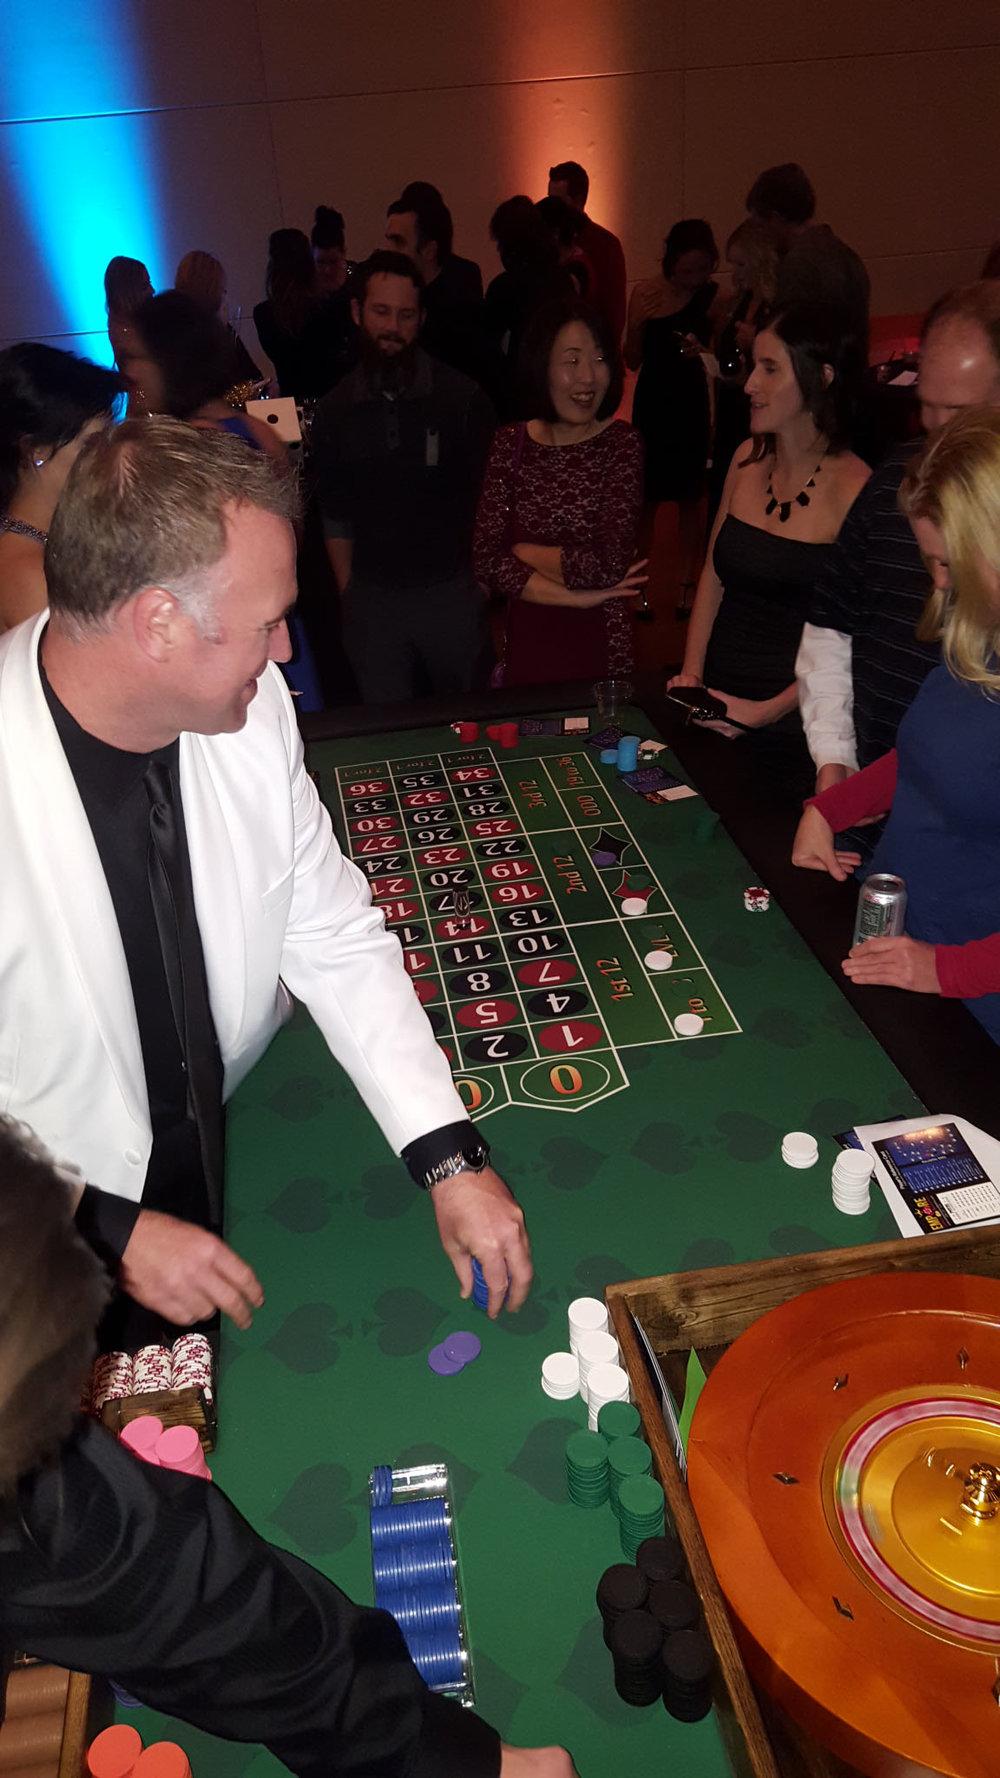 Wooden roulette buy black wooden roulette blackjack table led - Roulette Tables